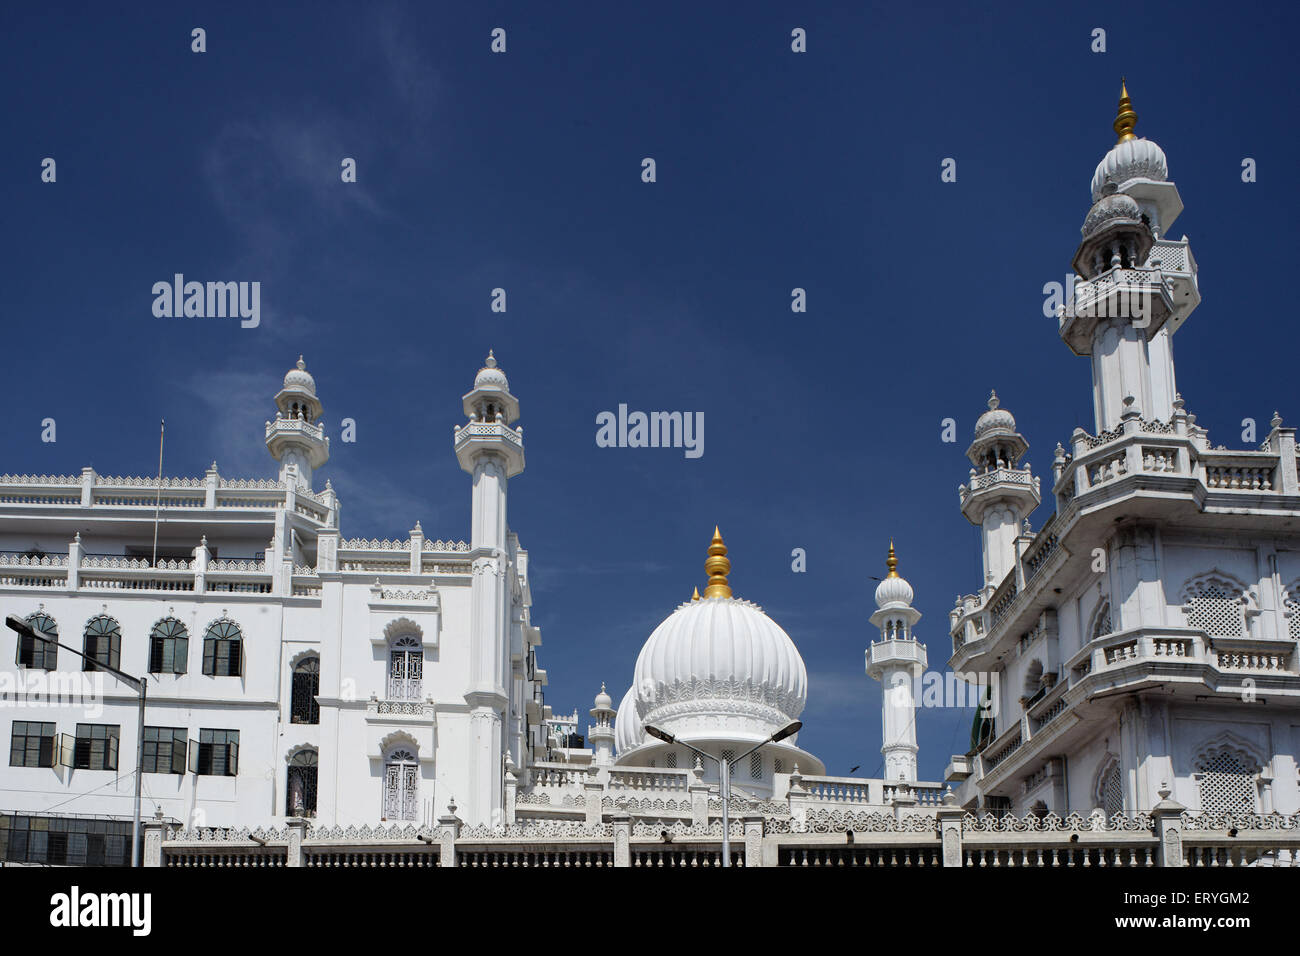 Jama masjid ; Bangalore ; Karnataka ; India - Stock Image